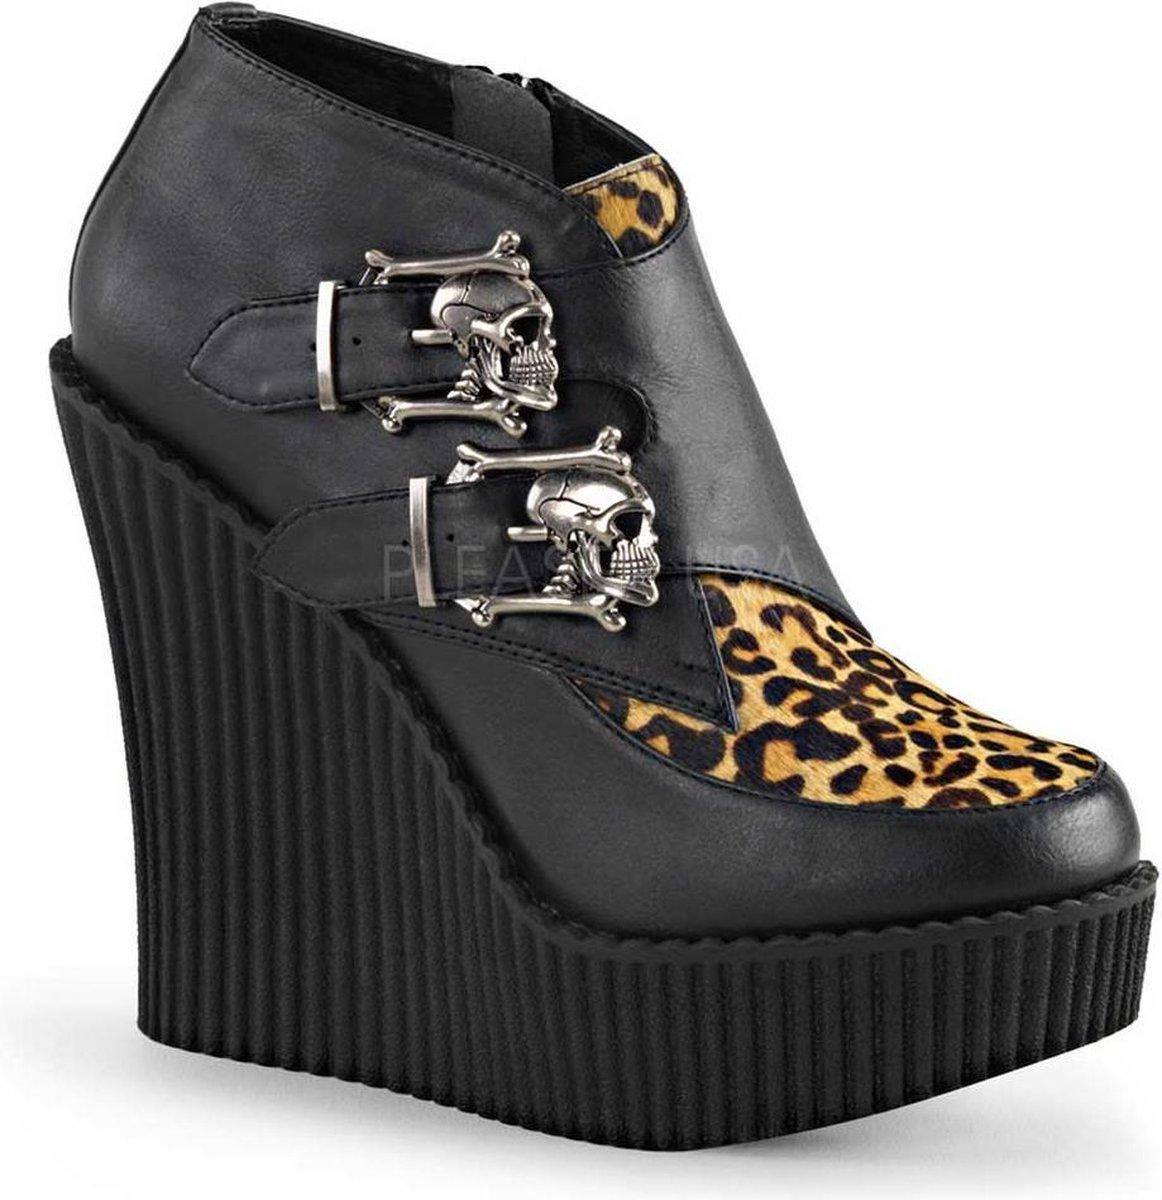 Demonia Sleehakken 40 Shoes POISON 101 US 10 Zwart